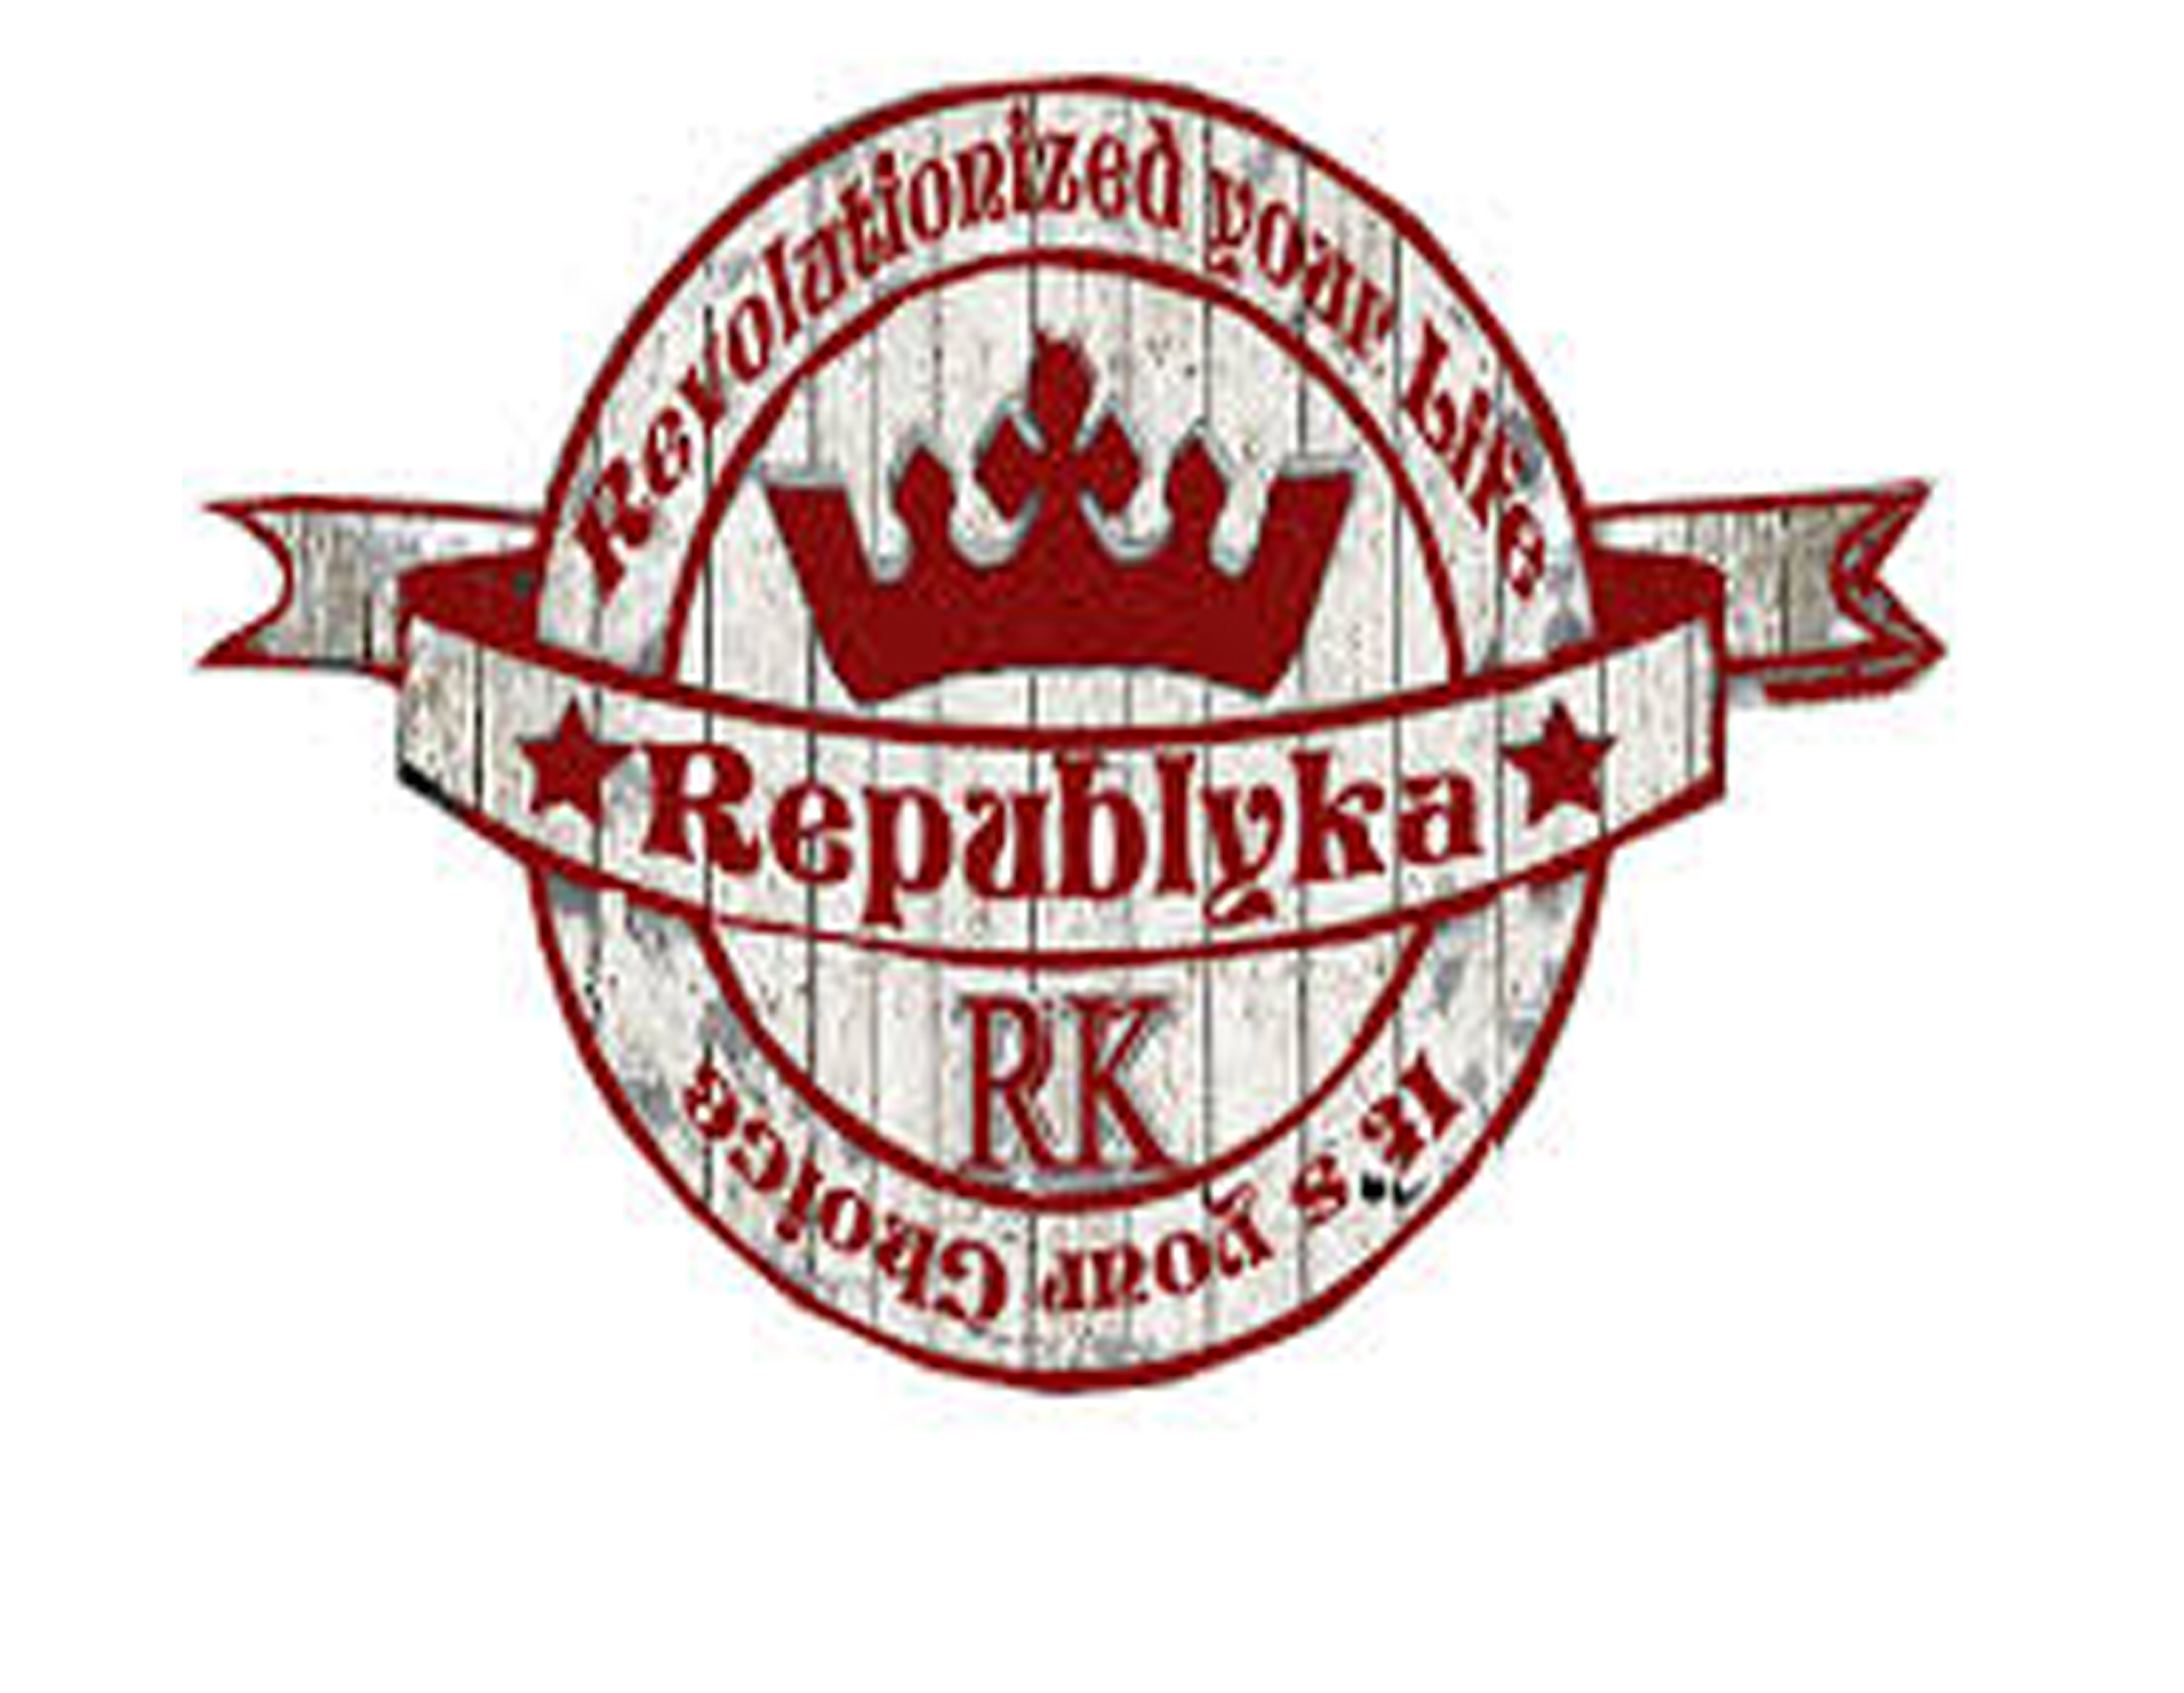 Republyka